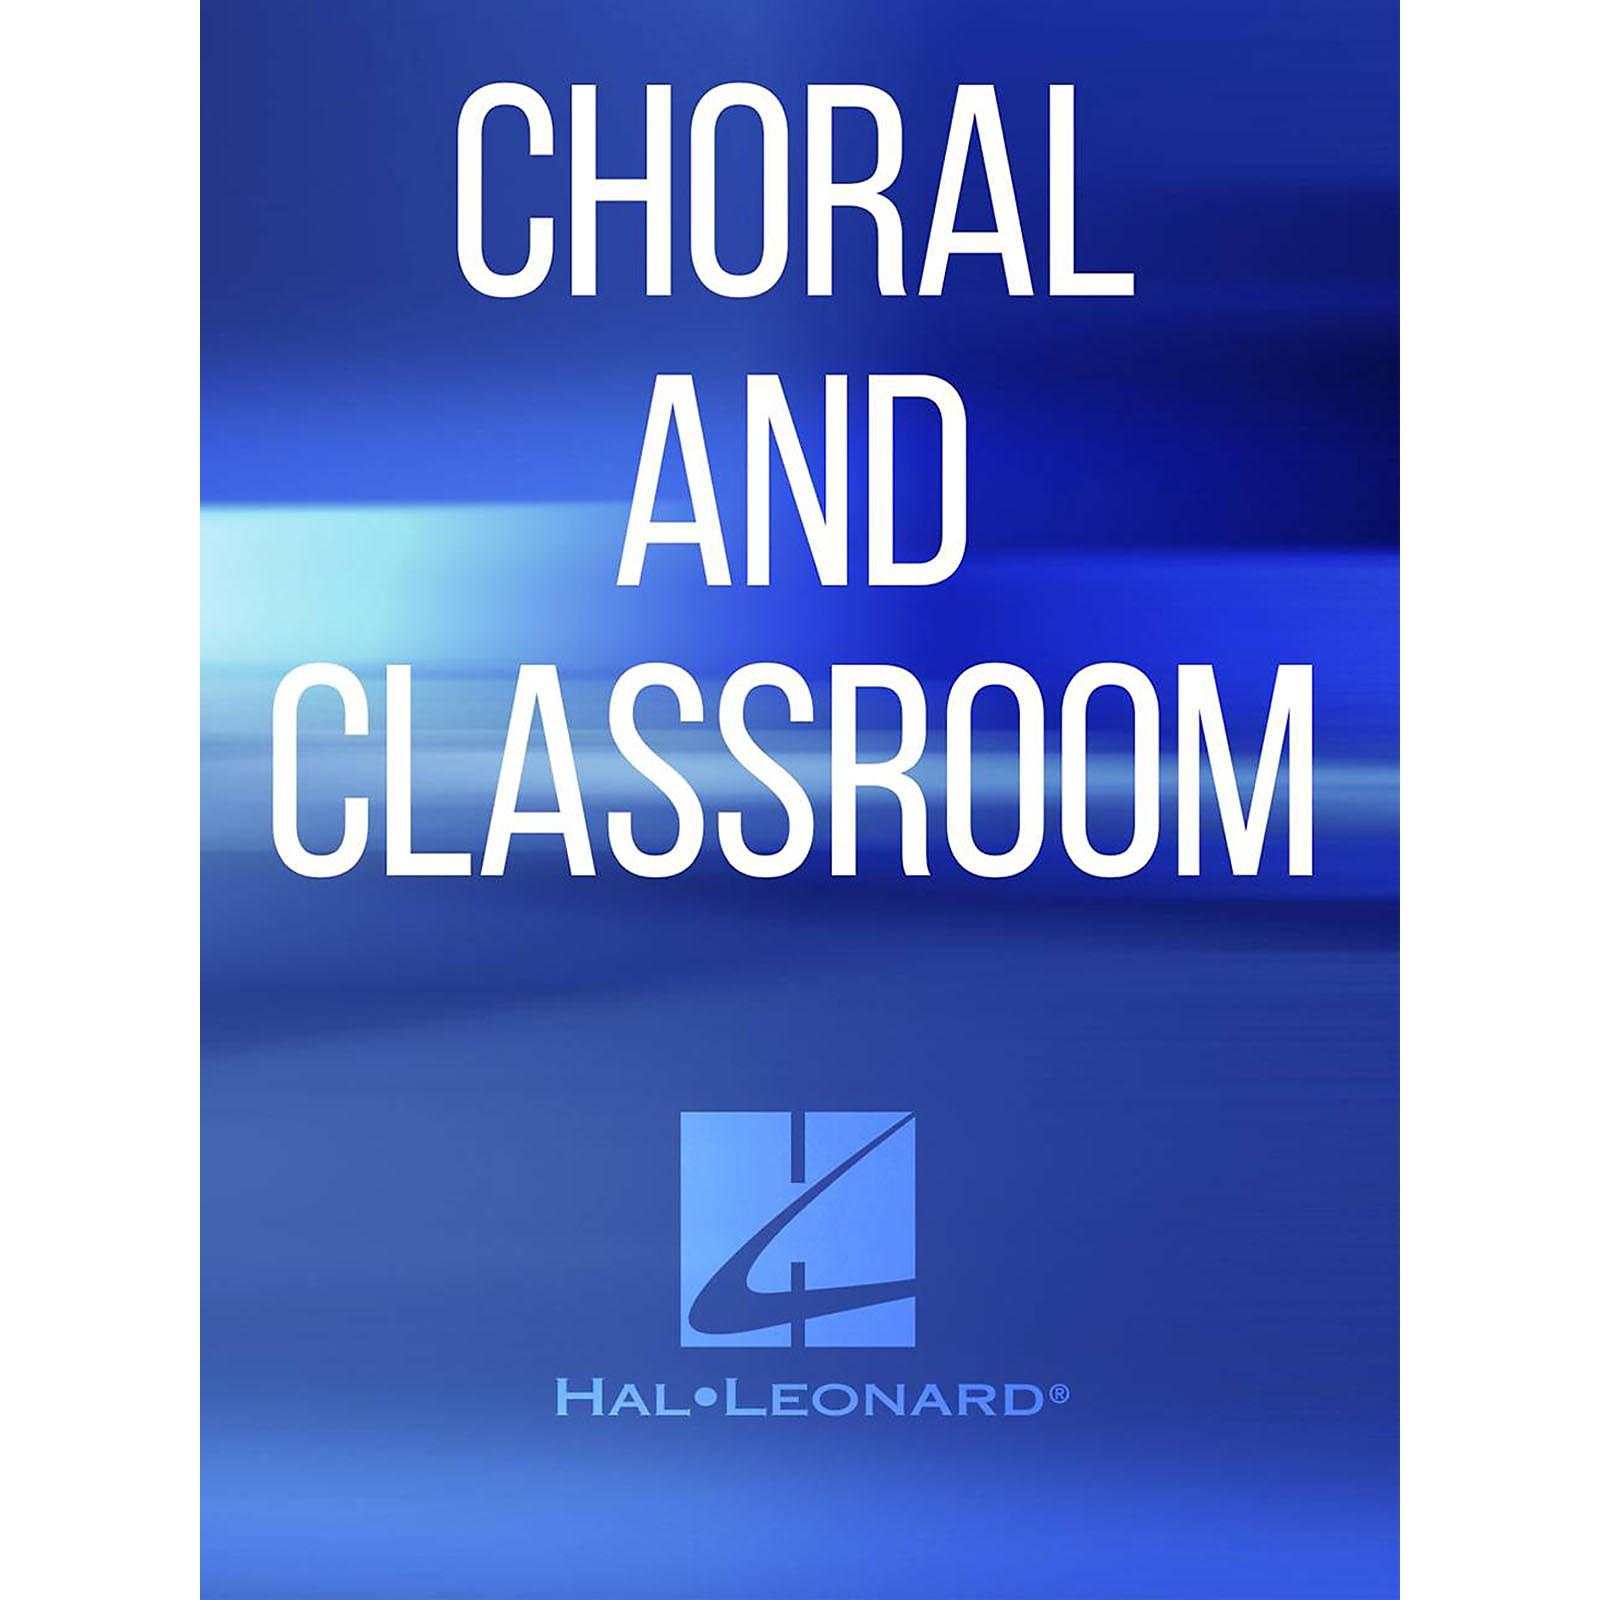 Hal Leonard Come Tune Your Cheerful Voice SATB Composed by Robin Benton